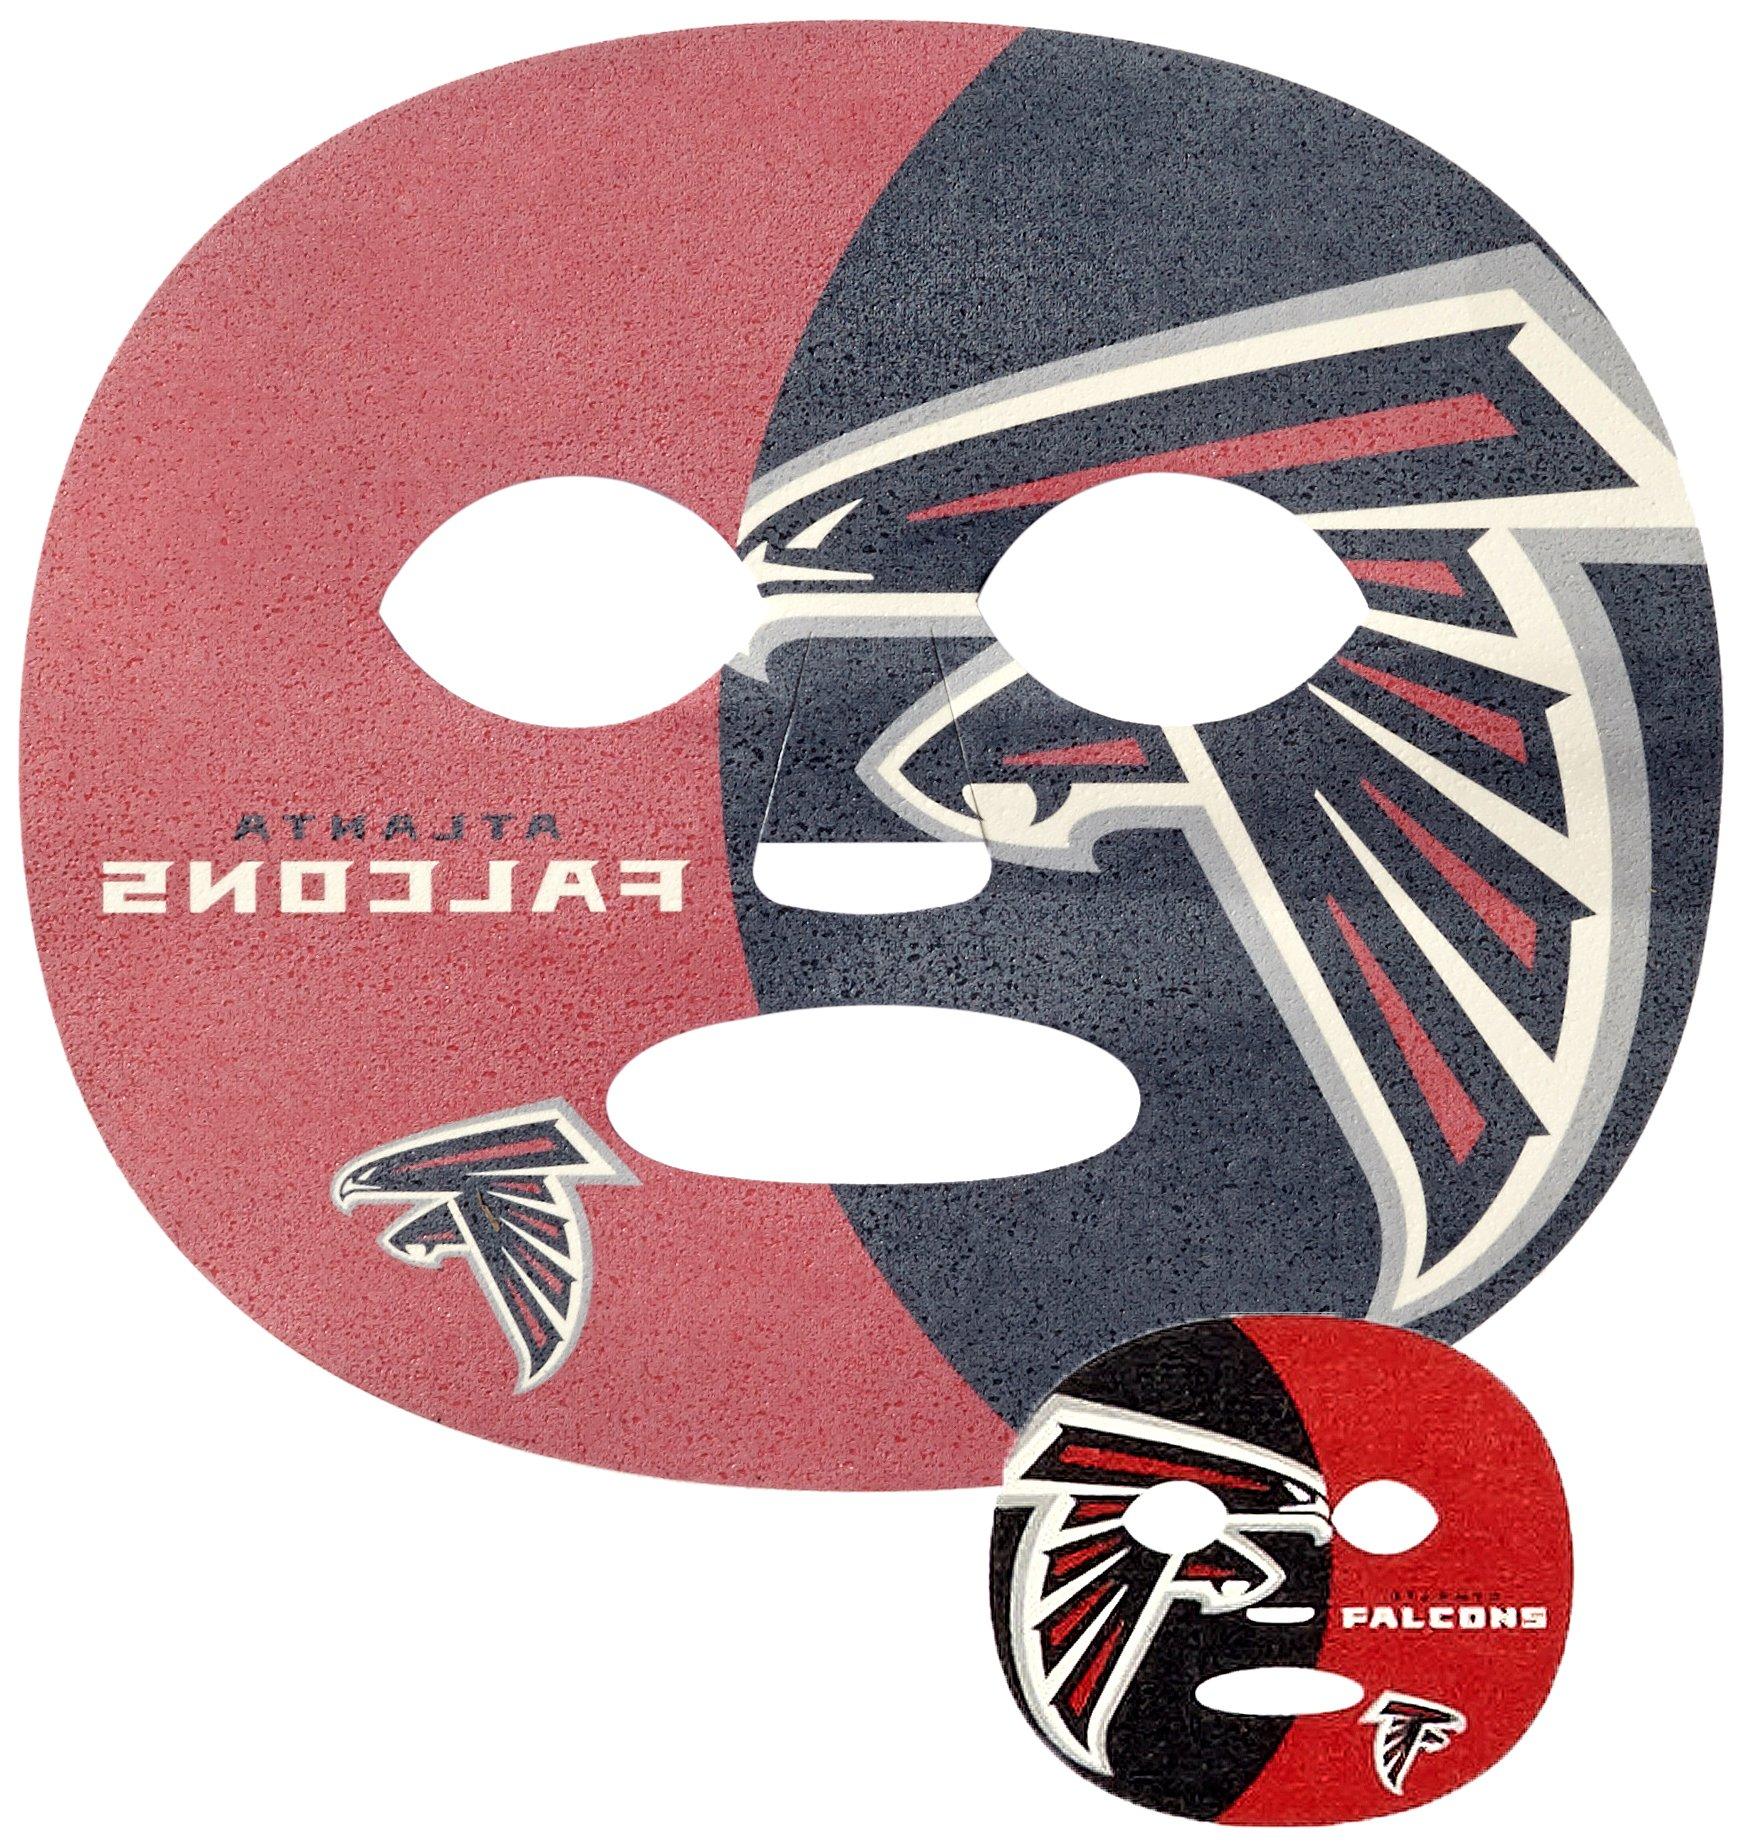 Siskiyou NFL Atlanta Falcons Game Day Face Temporary Tattoo